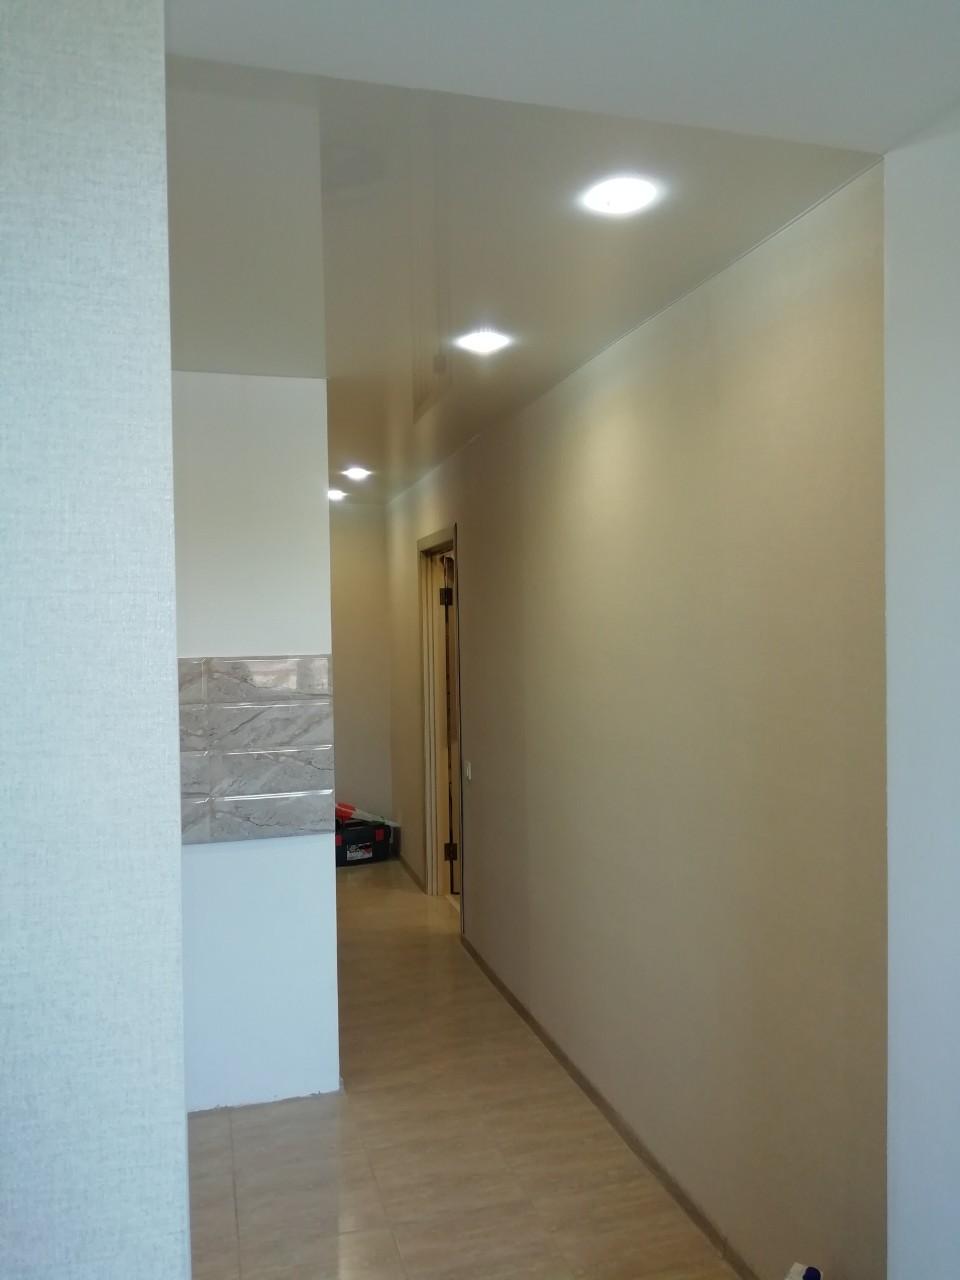 Ремонт квартир в Севастополе. Коридор